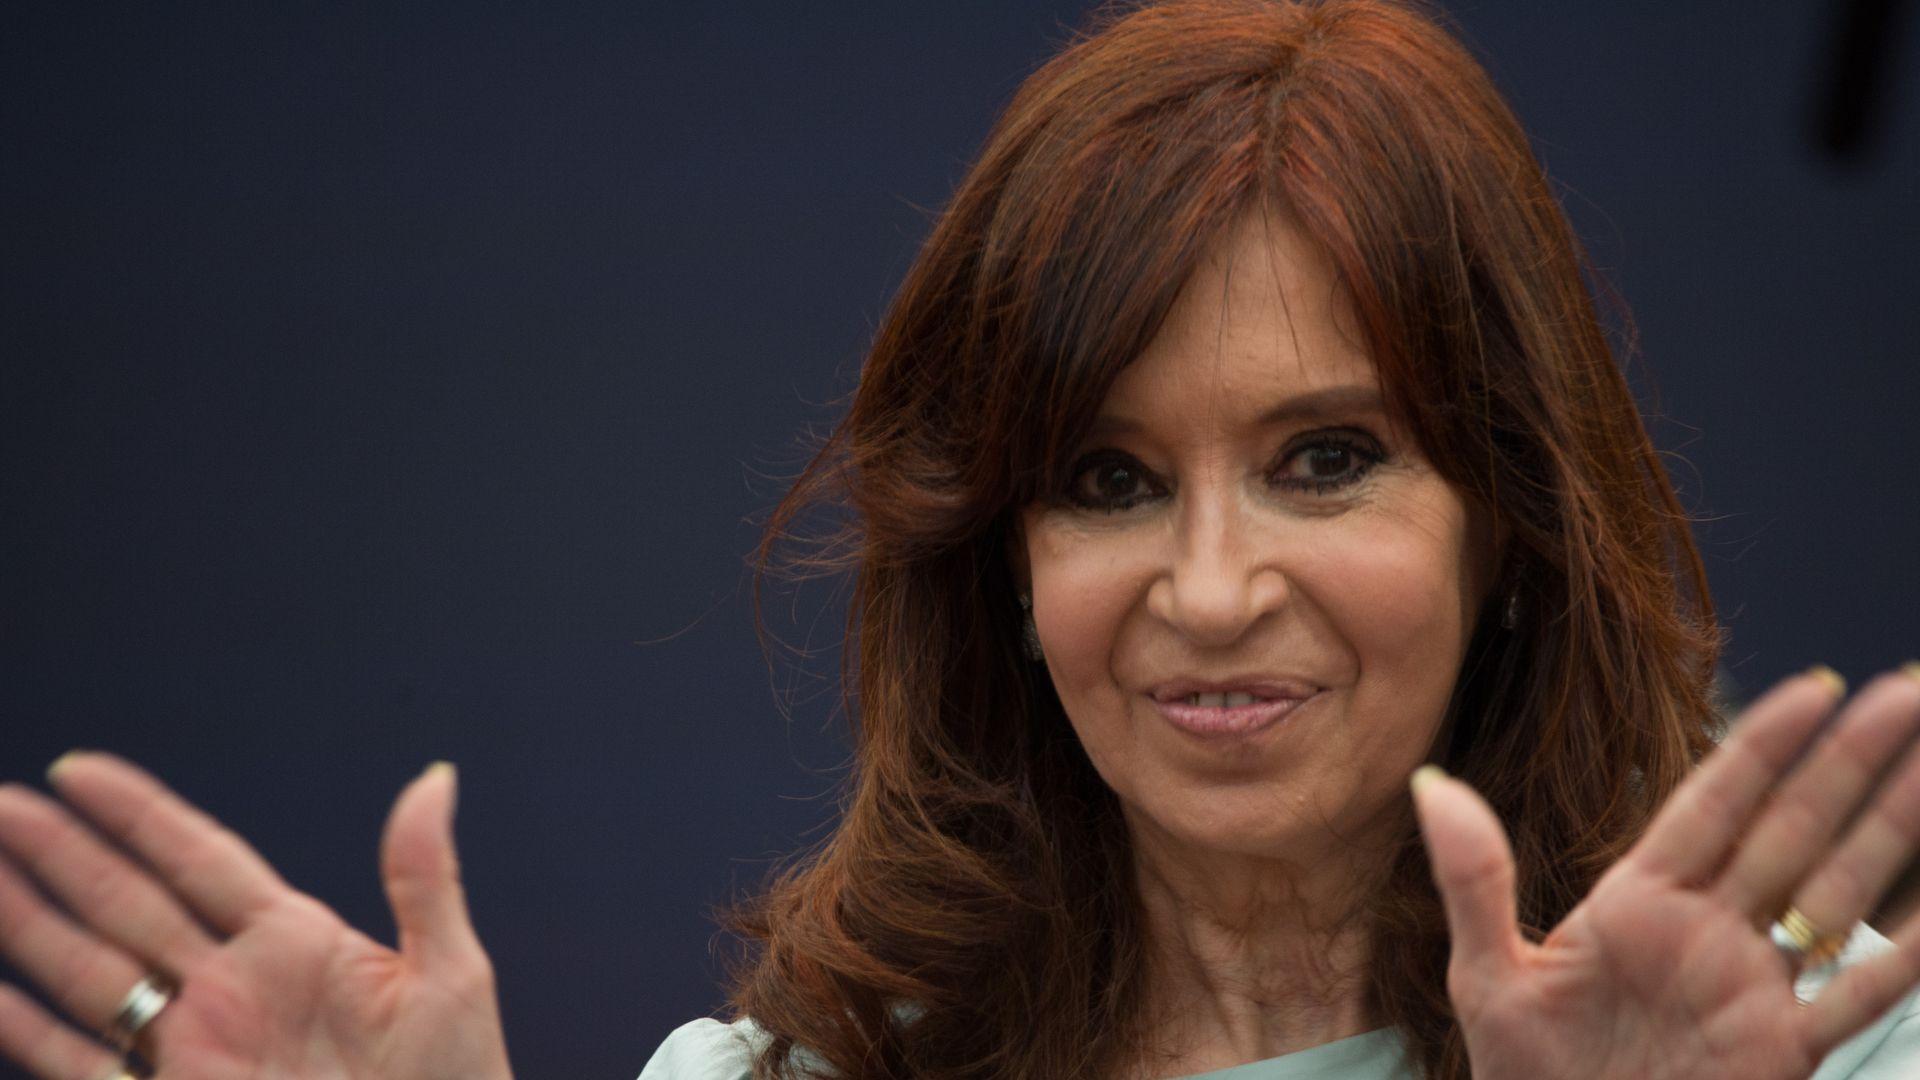 Argentina's former President Cristina Fernandez de Kirchner